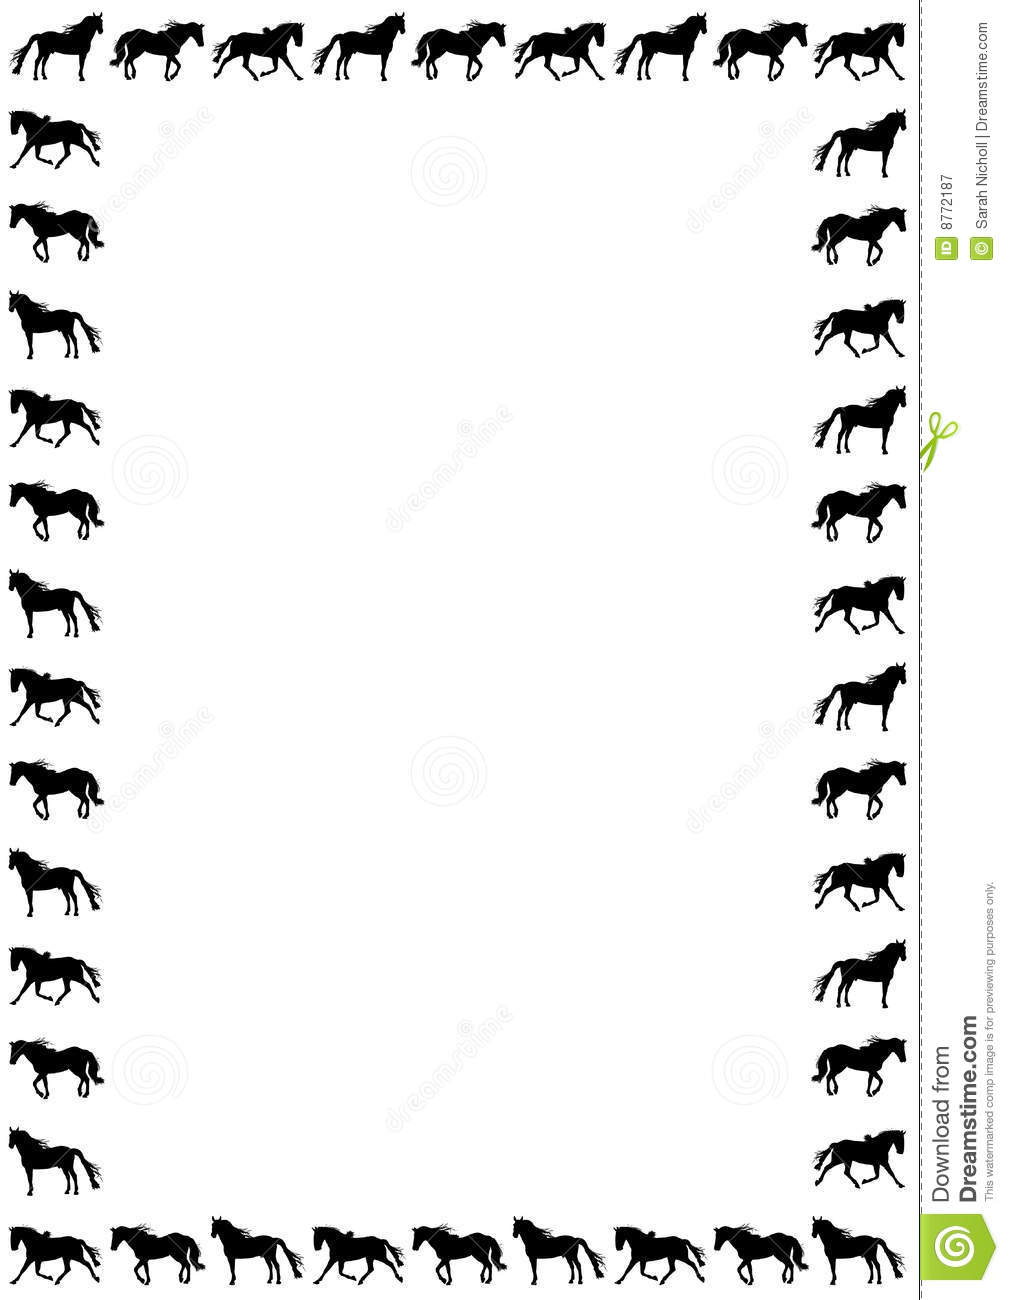 Frame clipart horse Pinterest horse Horse art Horse